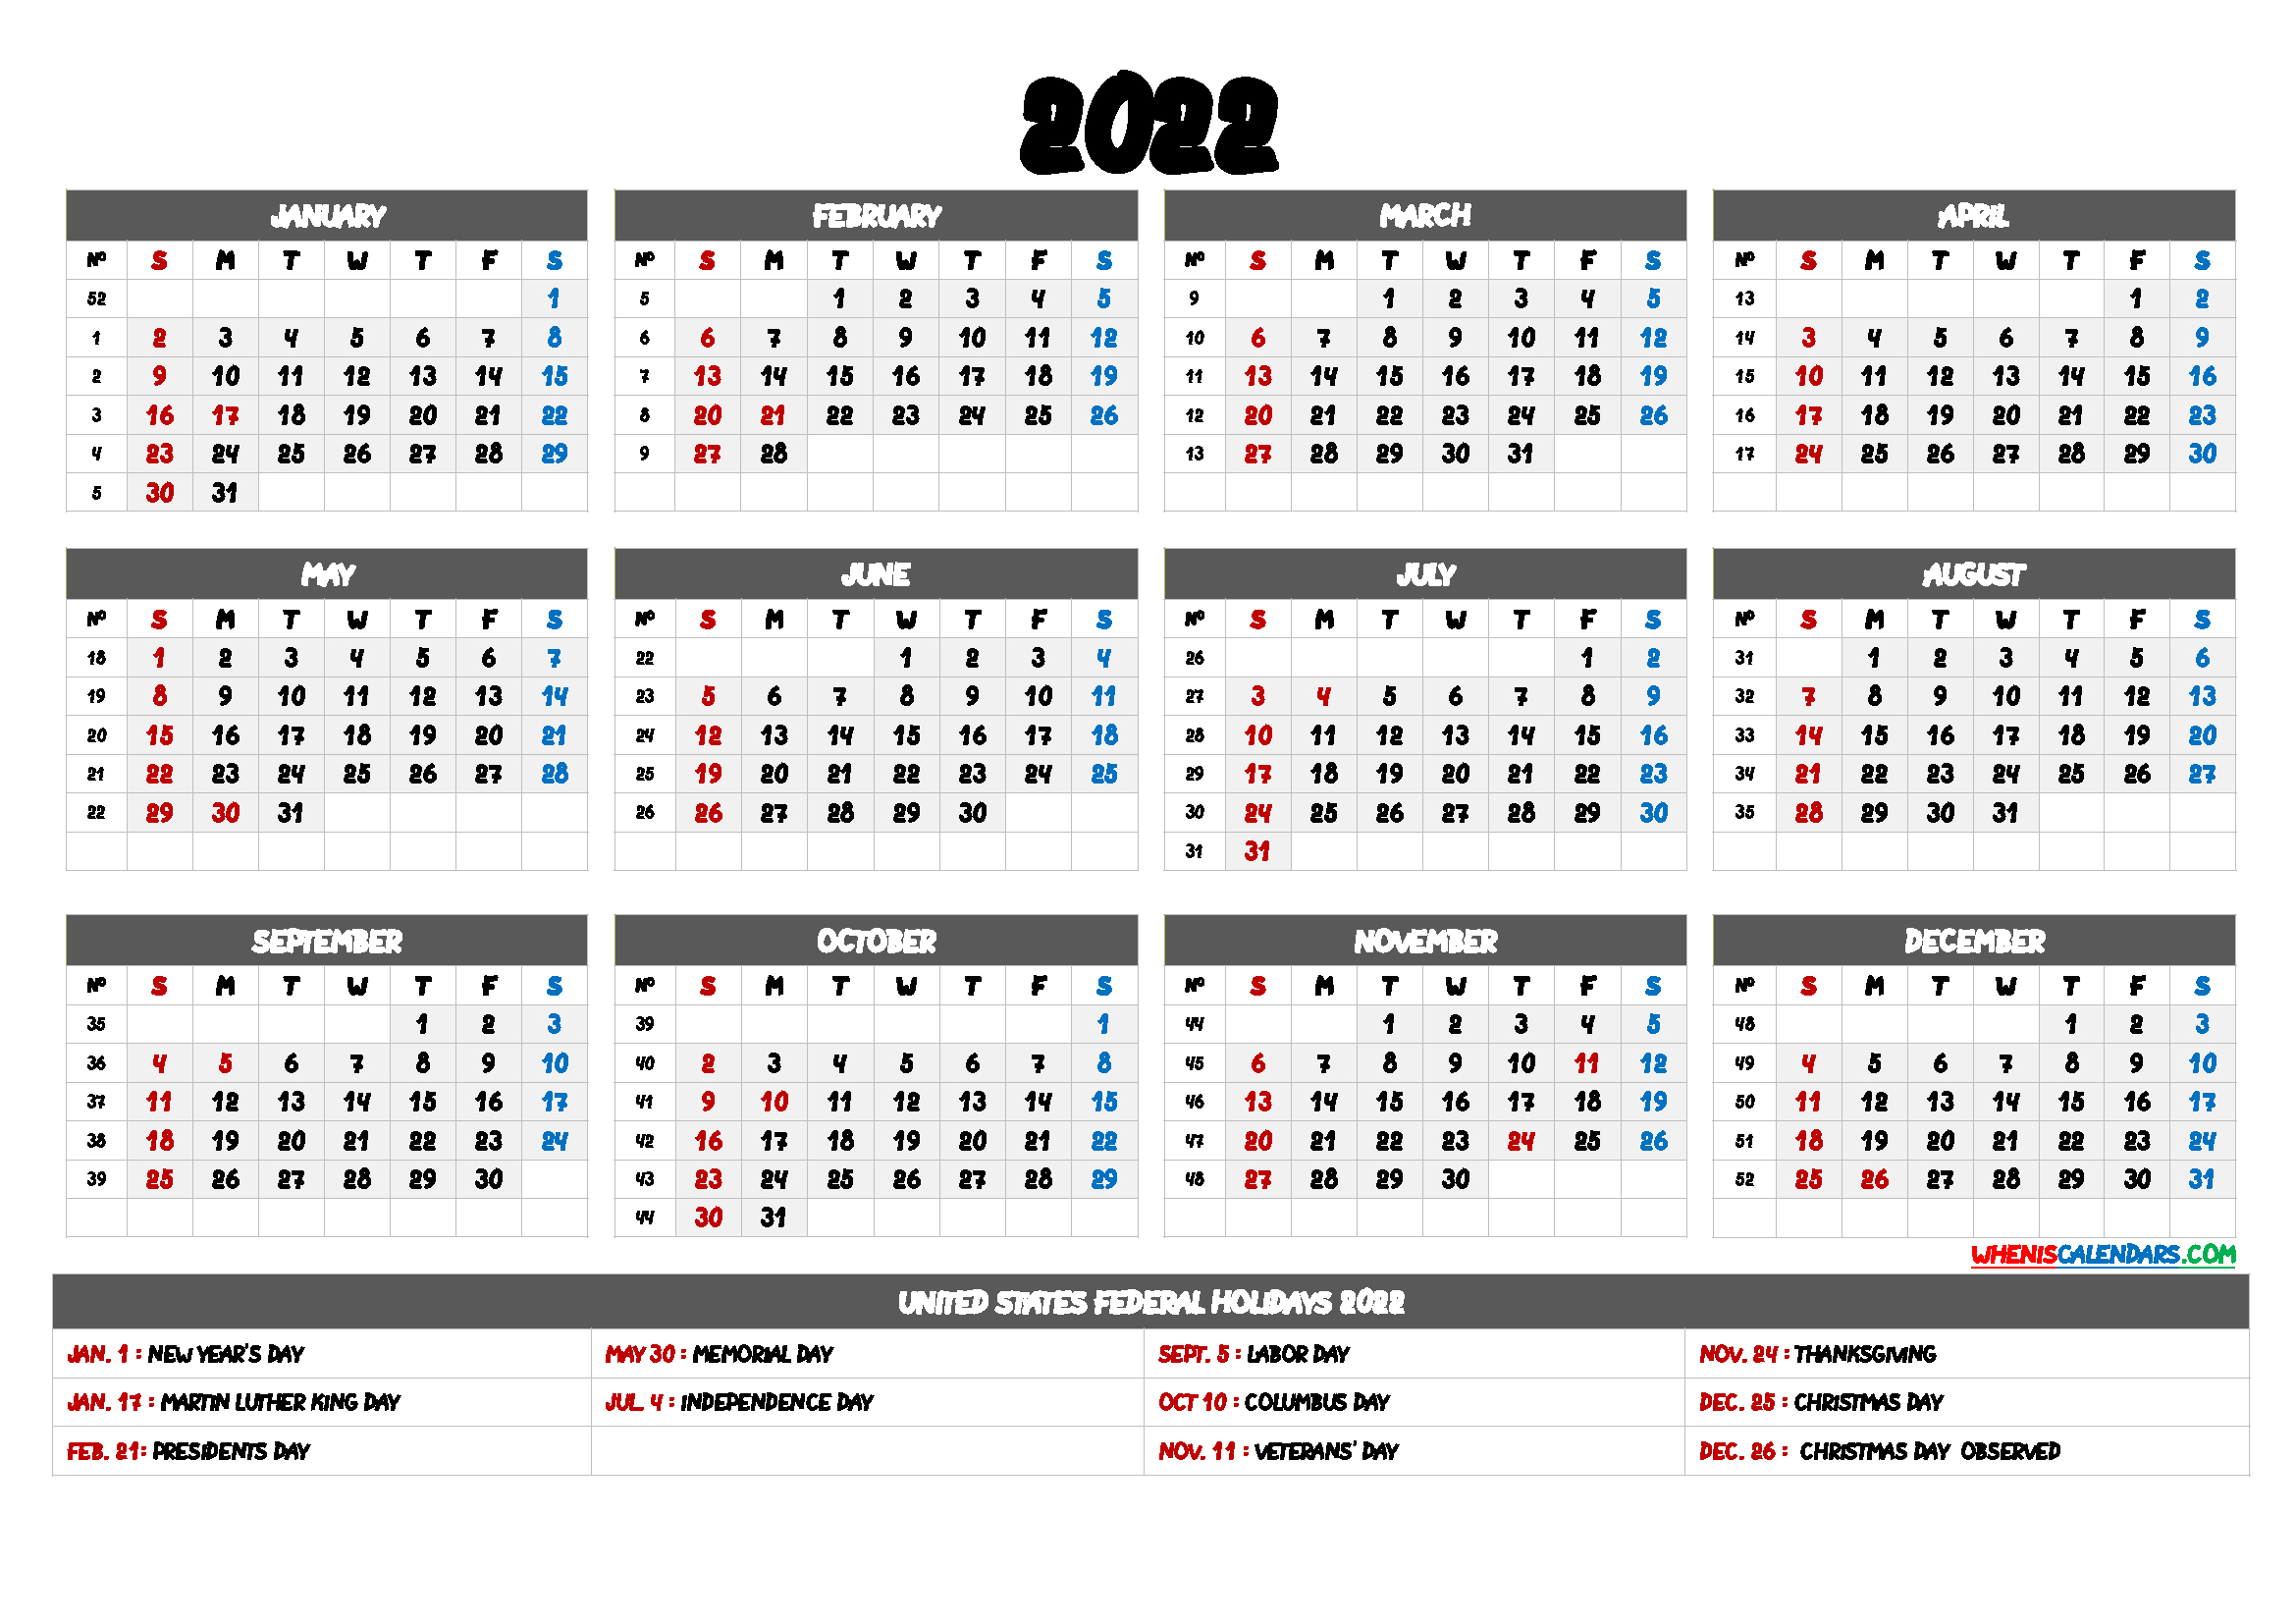 20+ 2022 Holidays - Free Download Printable Calendar regarding Julian Date For 2022